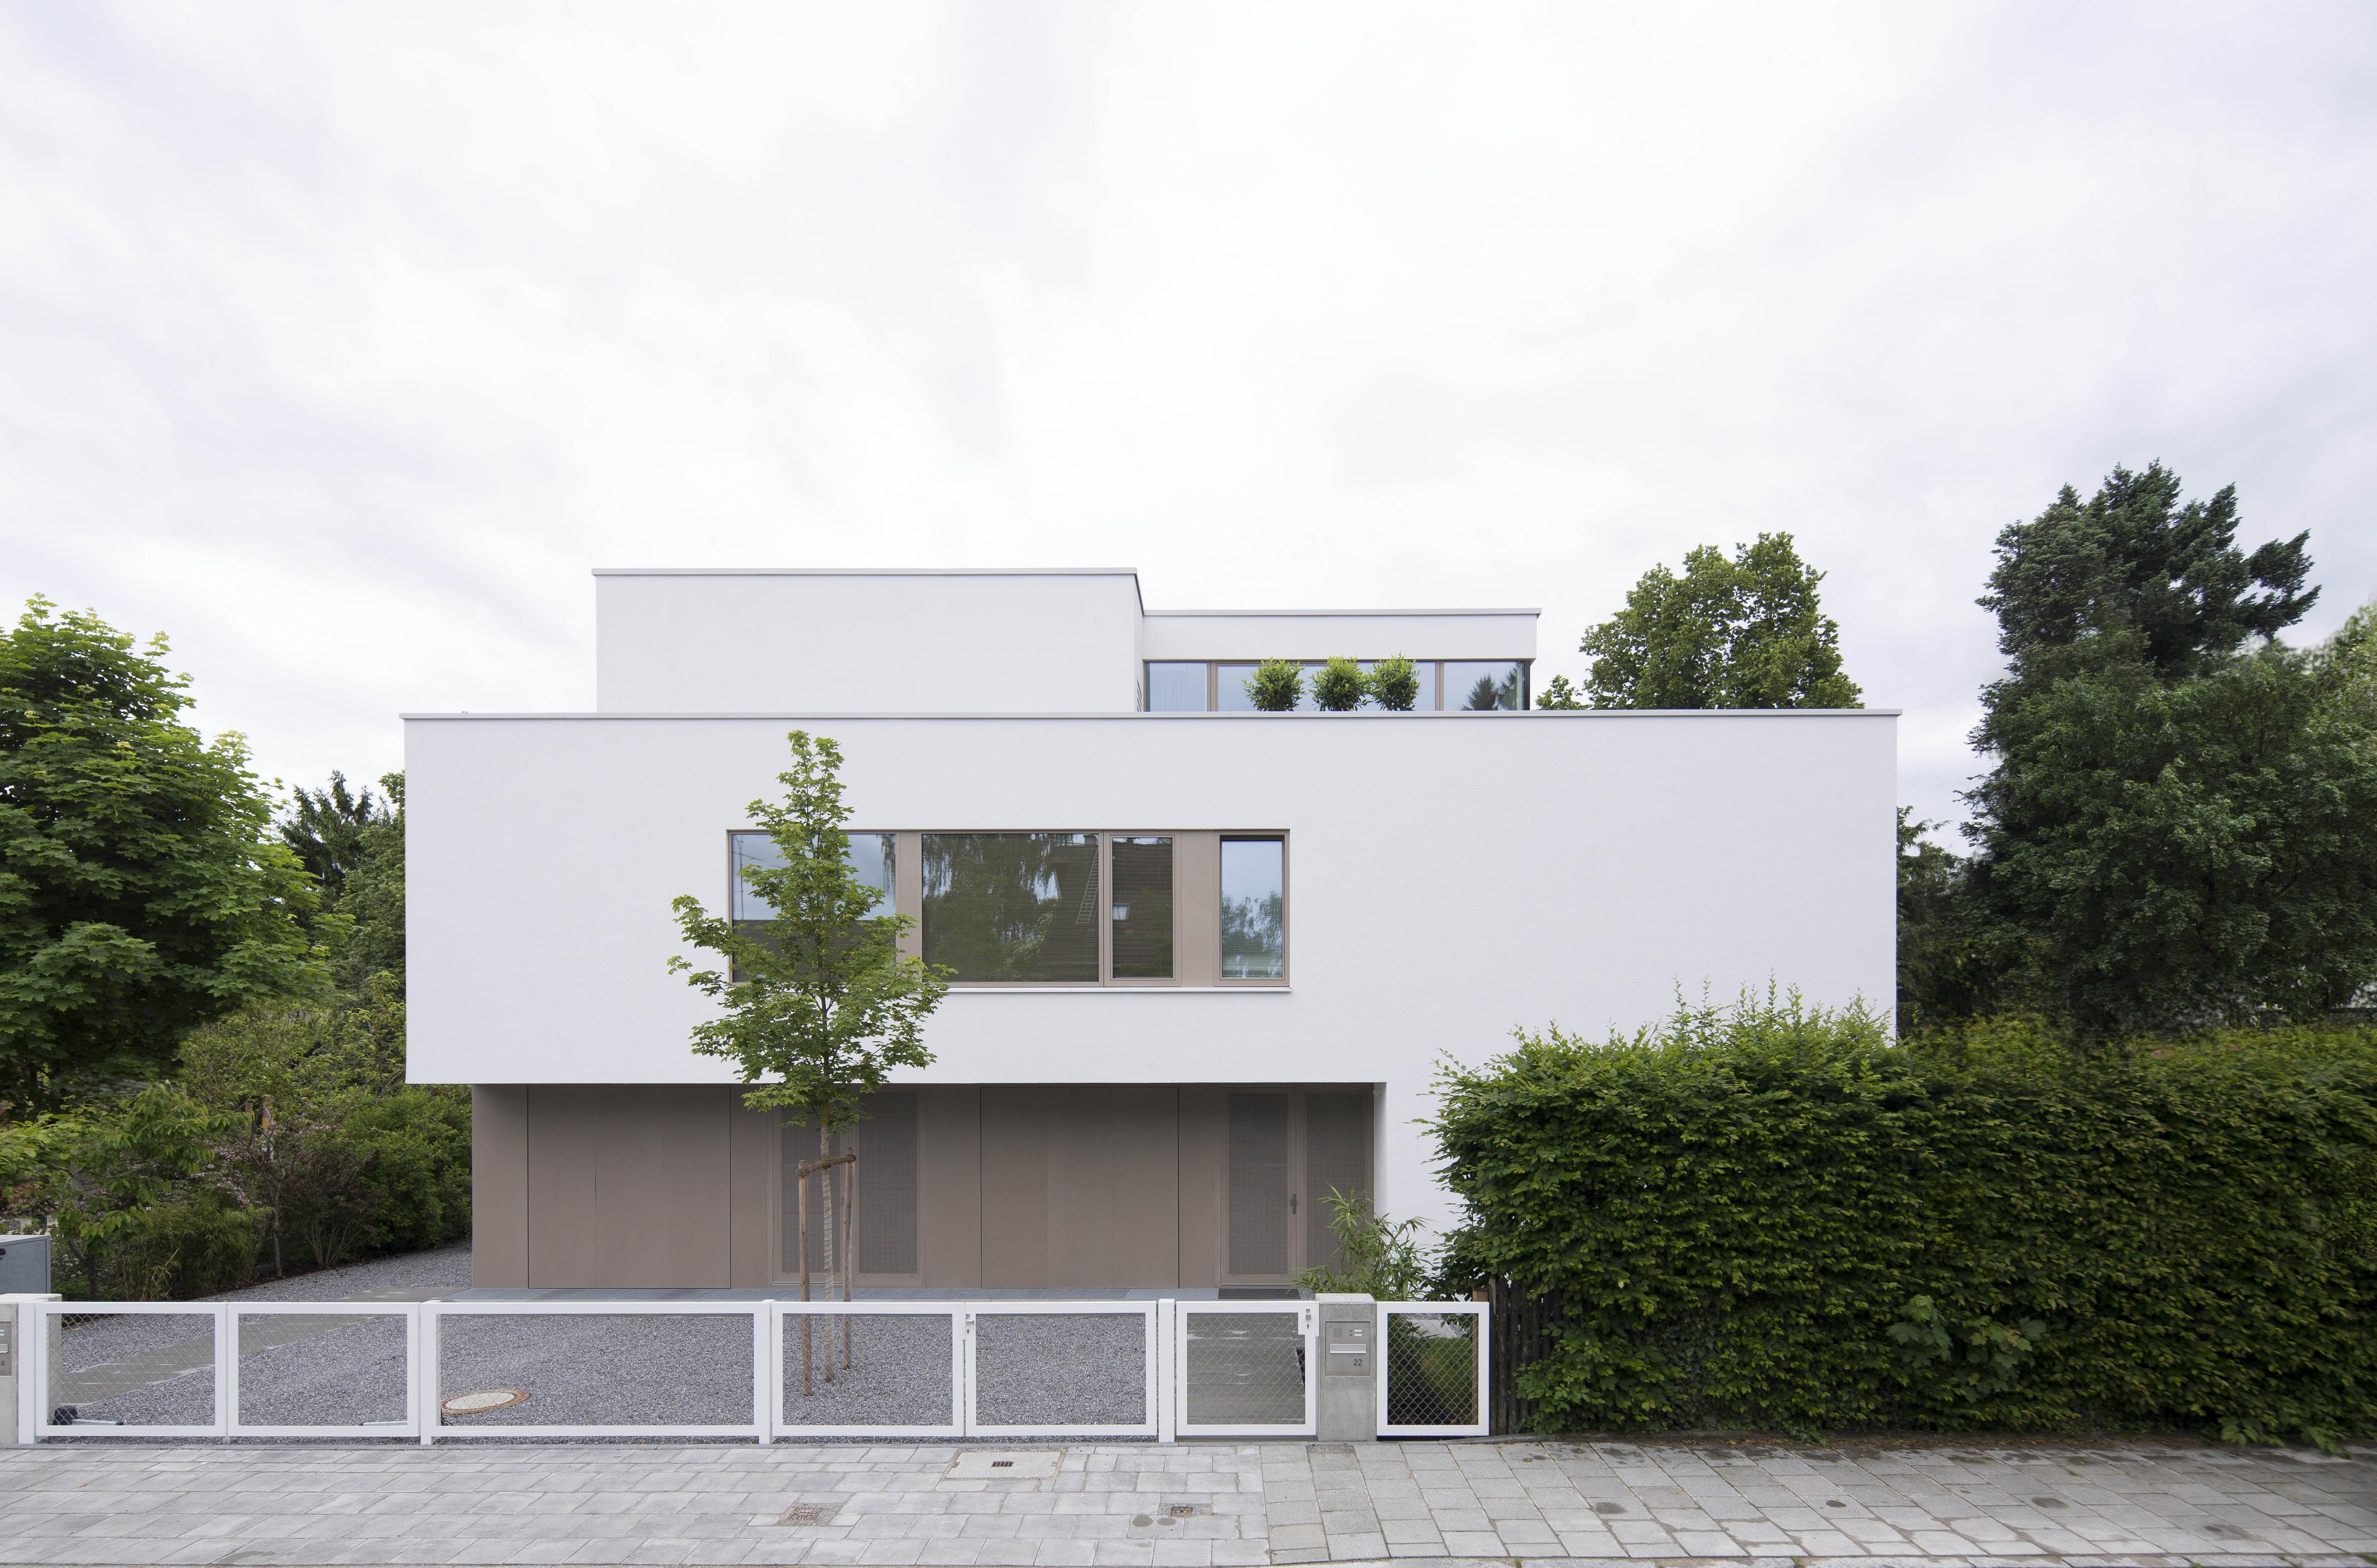 haus h in m nchen solln muenchenarchitektur. Black Bedroom Furniture Sets. Home Design Ideas